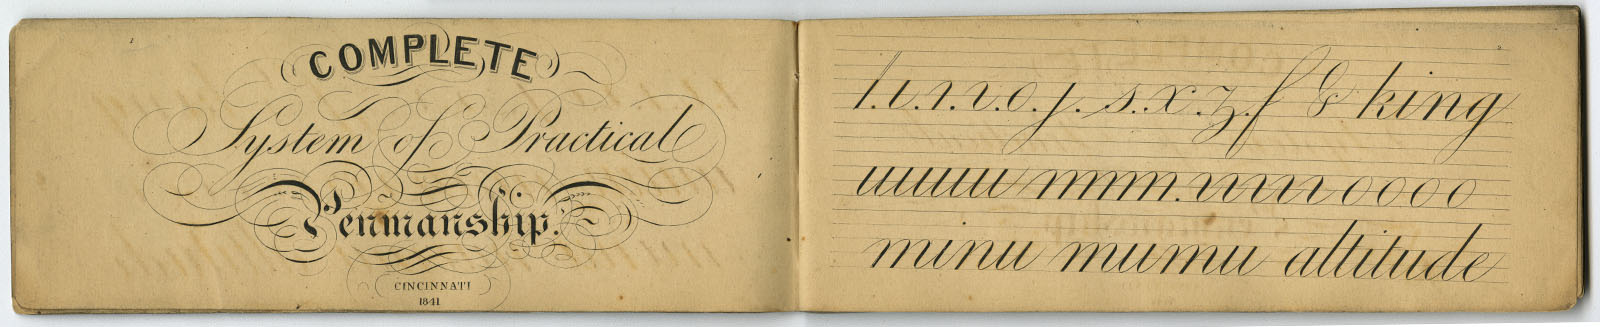 Complete System of Practical Penmanship (Cincinnati, 1841).